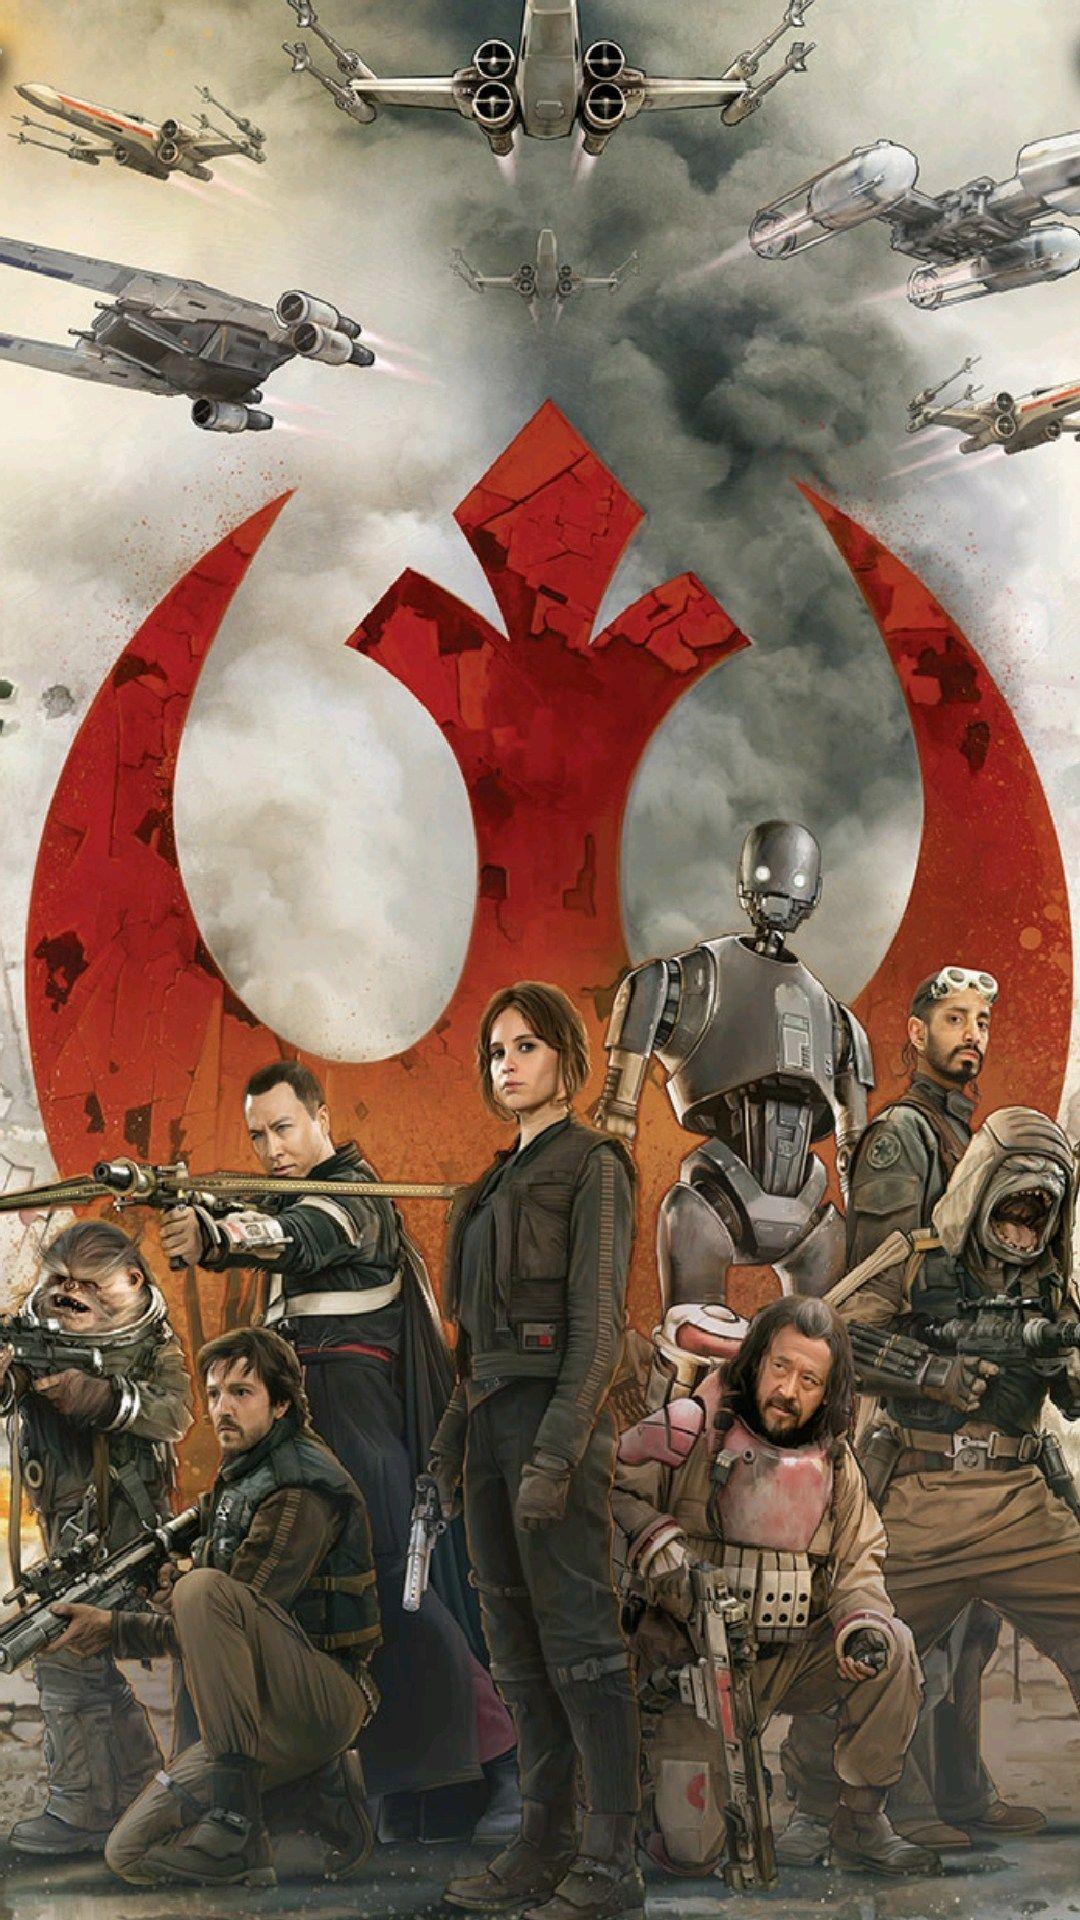 Rogue One hd wallpaper